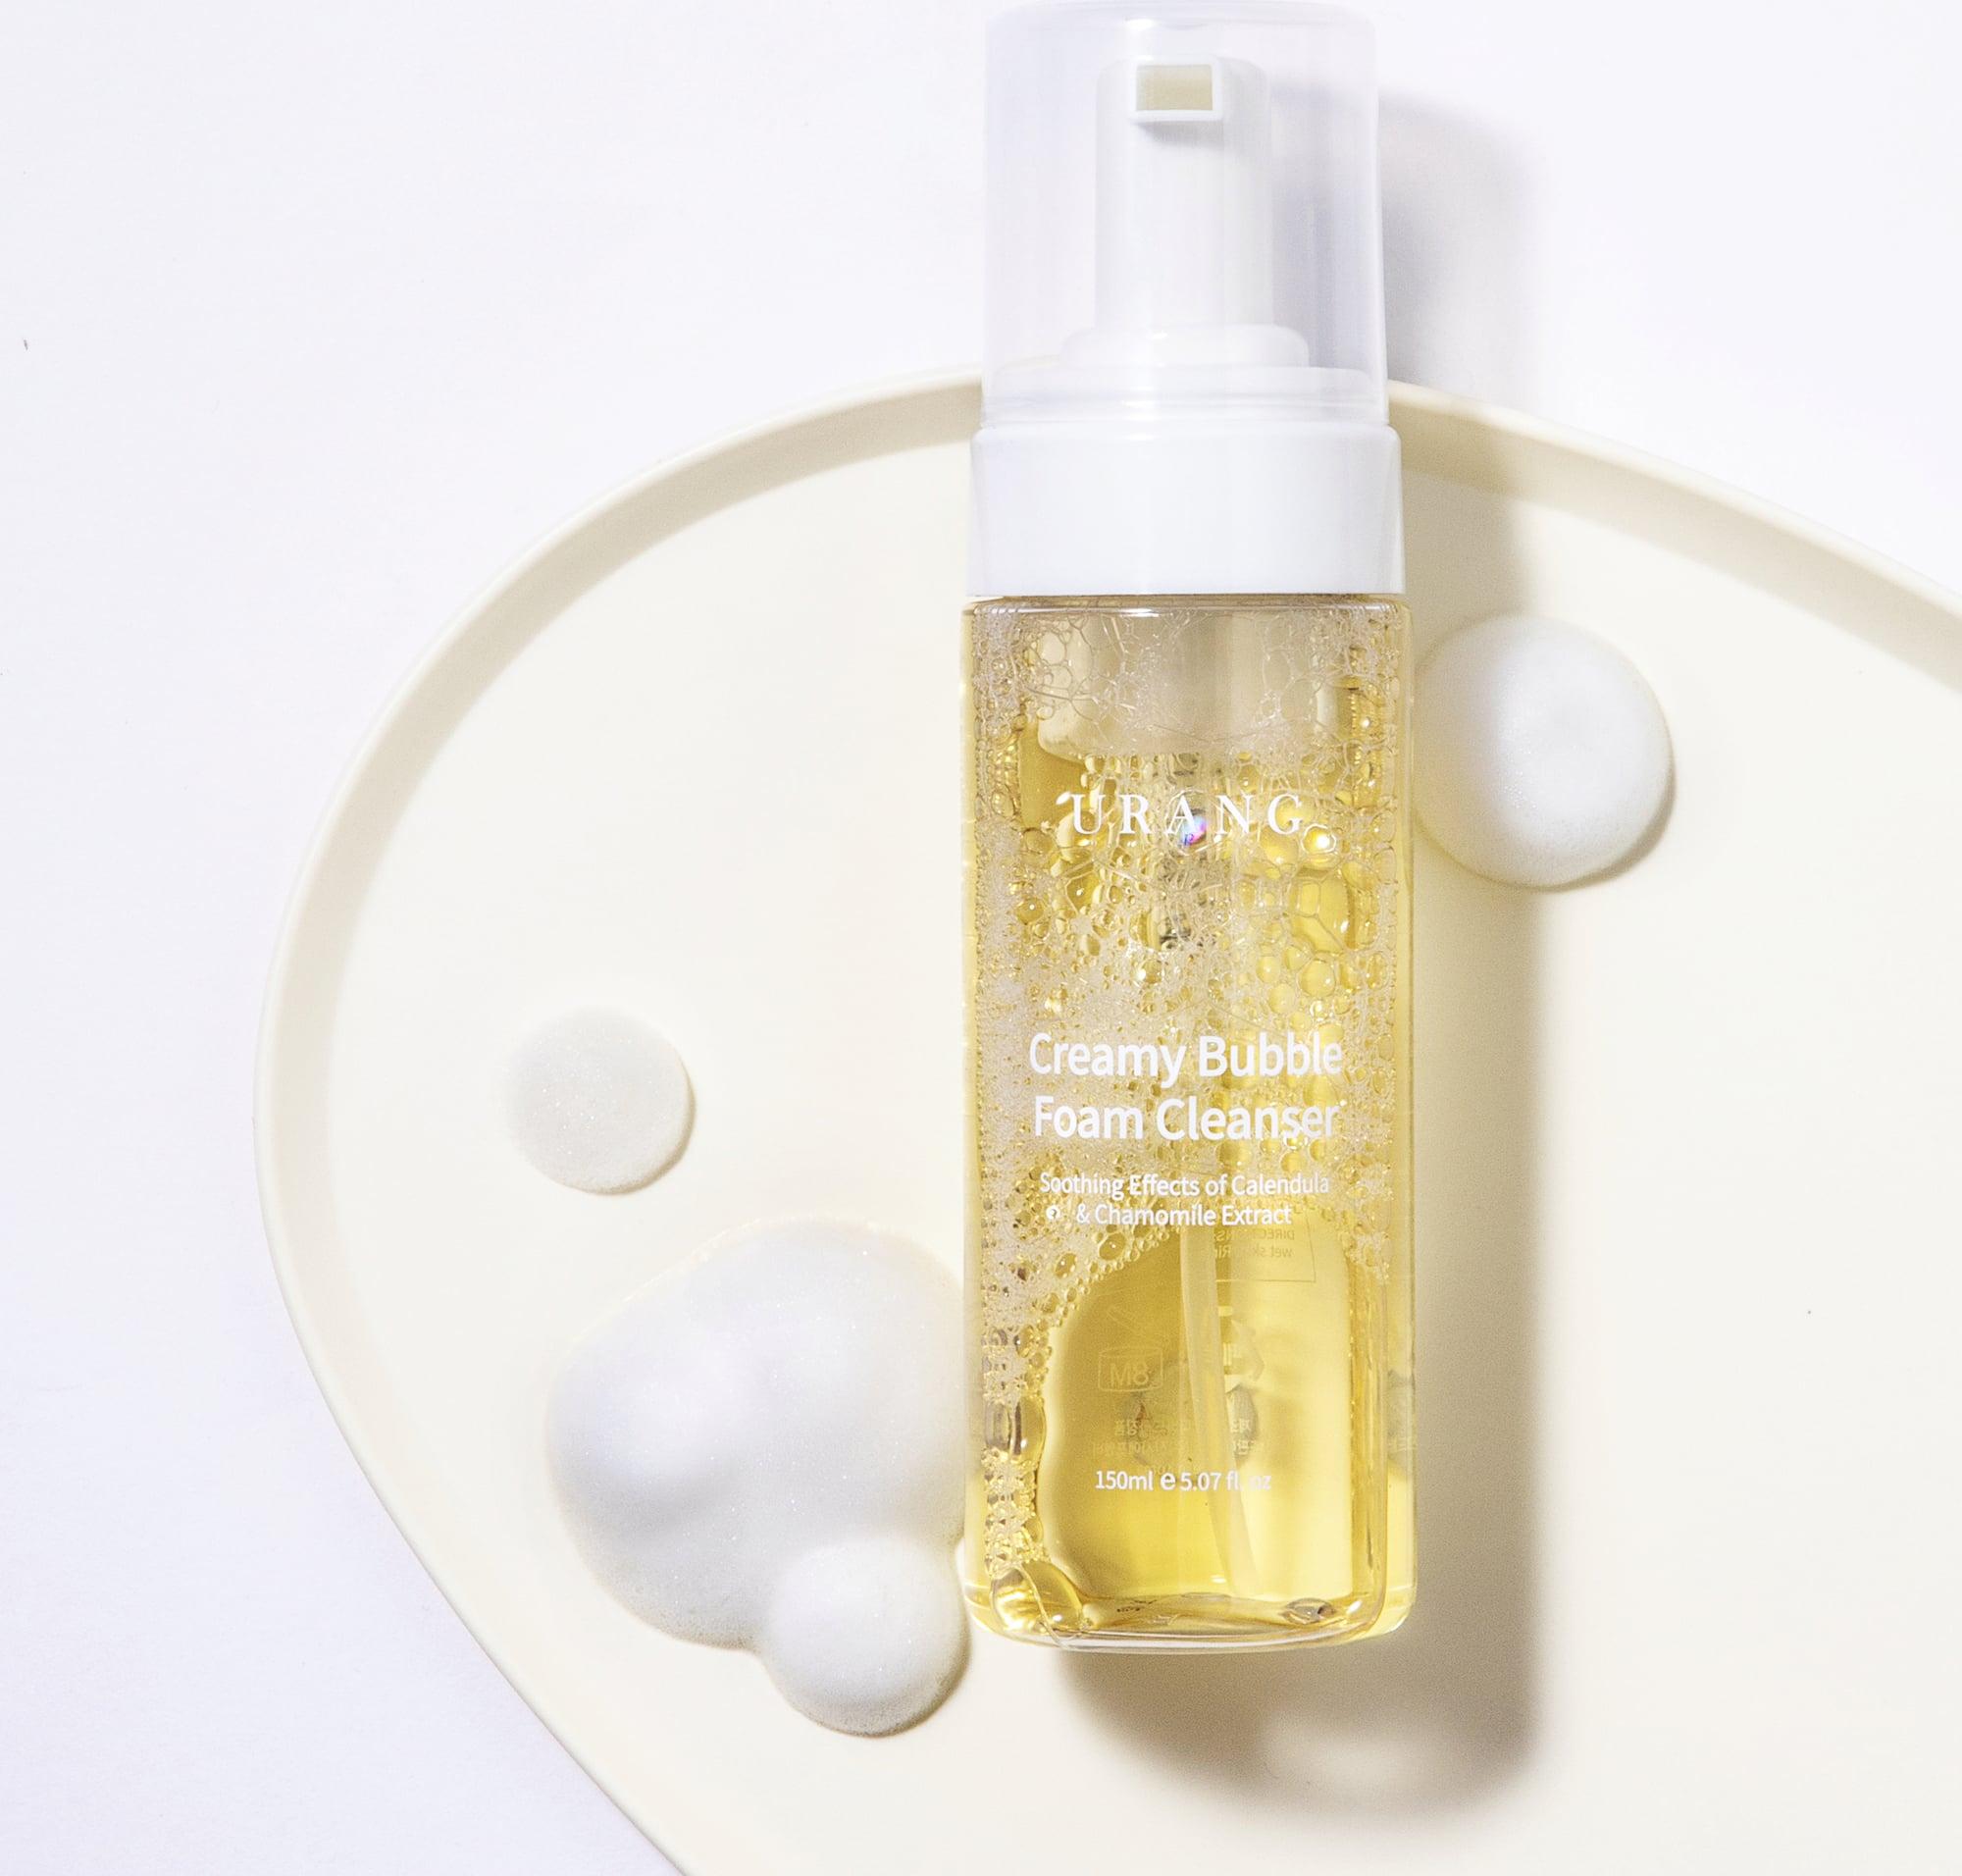 nettoyant-visage-coreen-naturel-urang-creamy-bubble-foam-cleanser-avis-revue